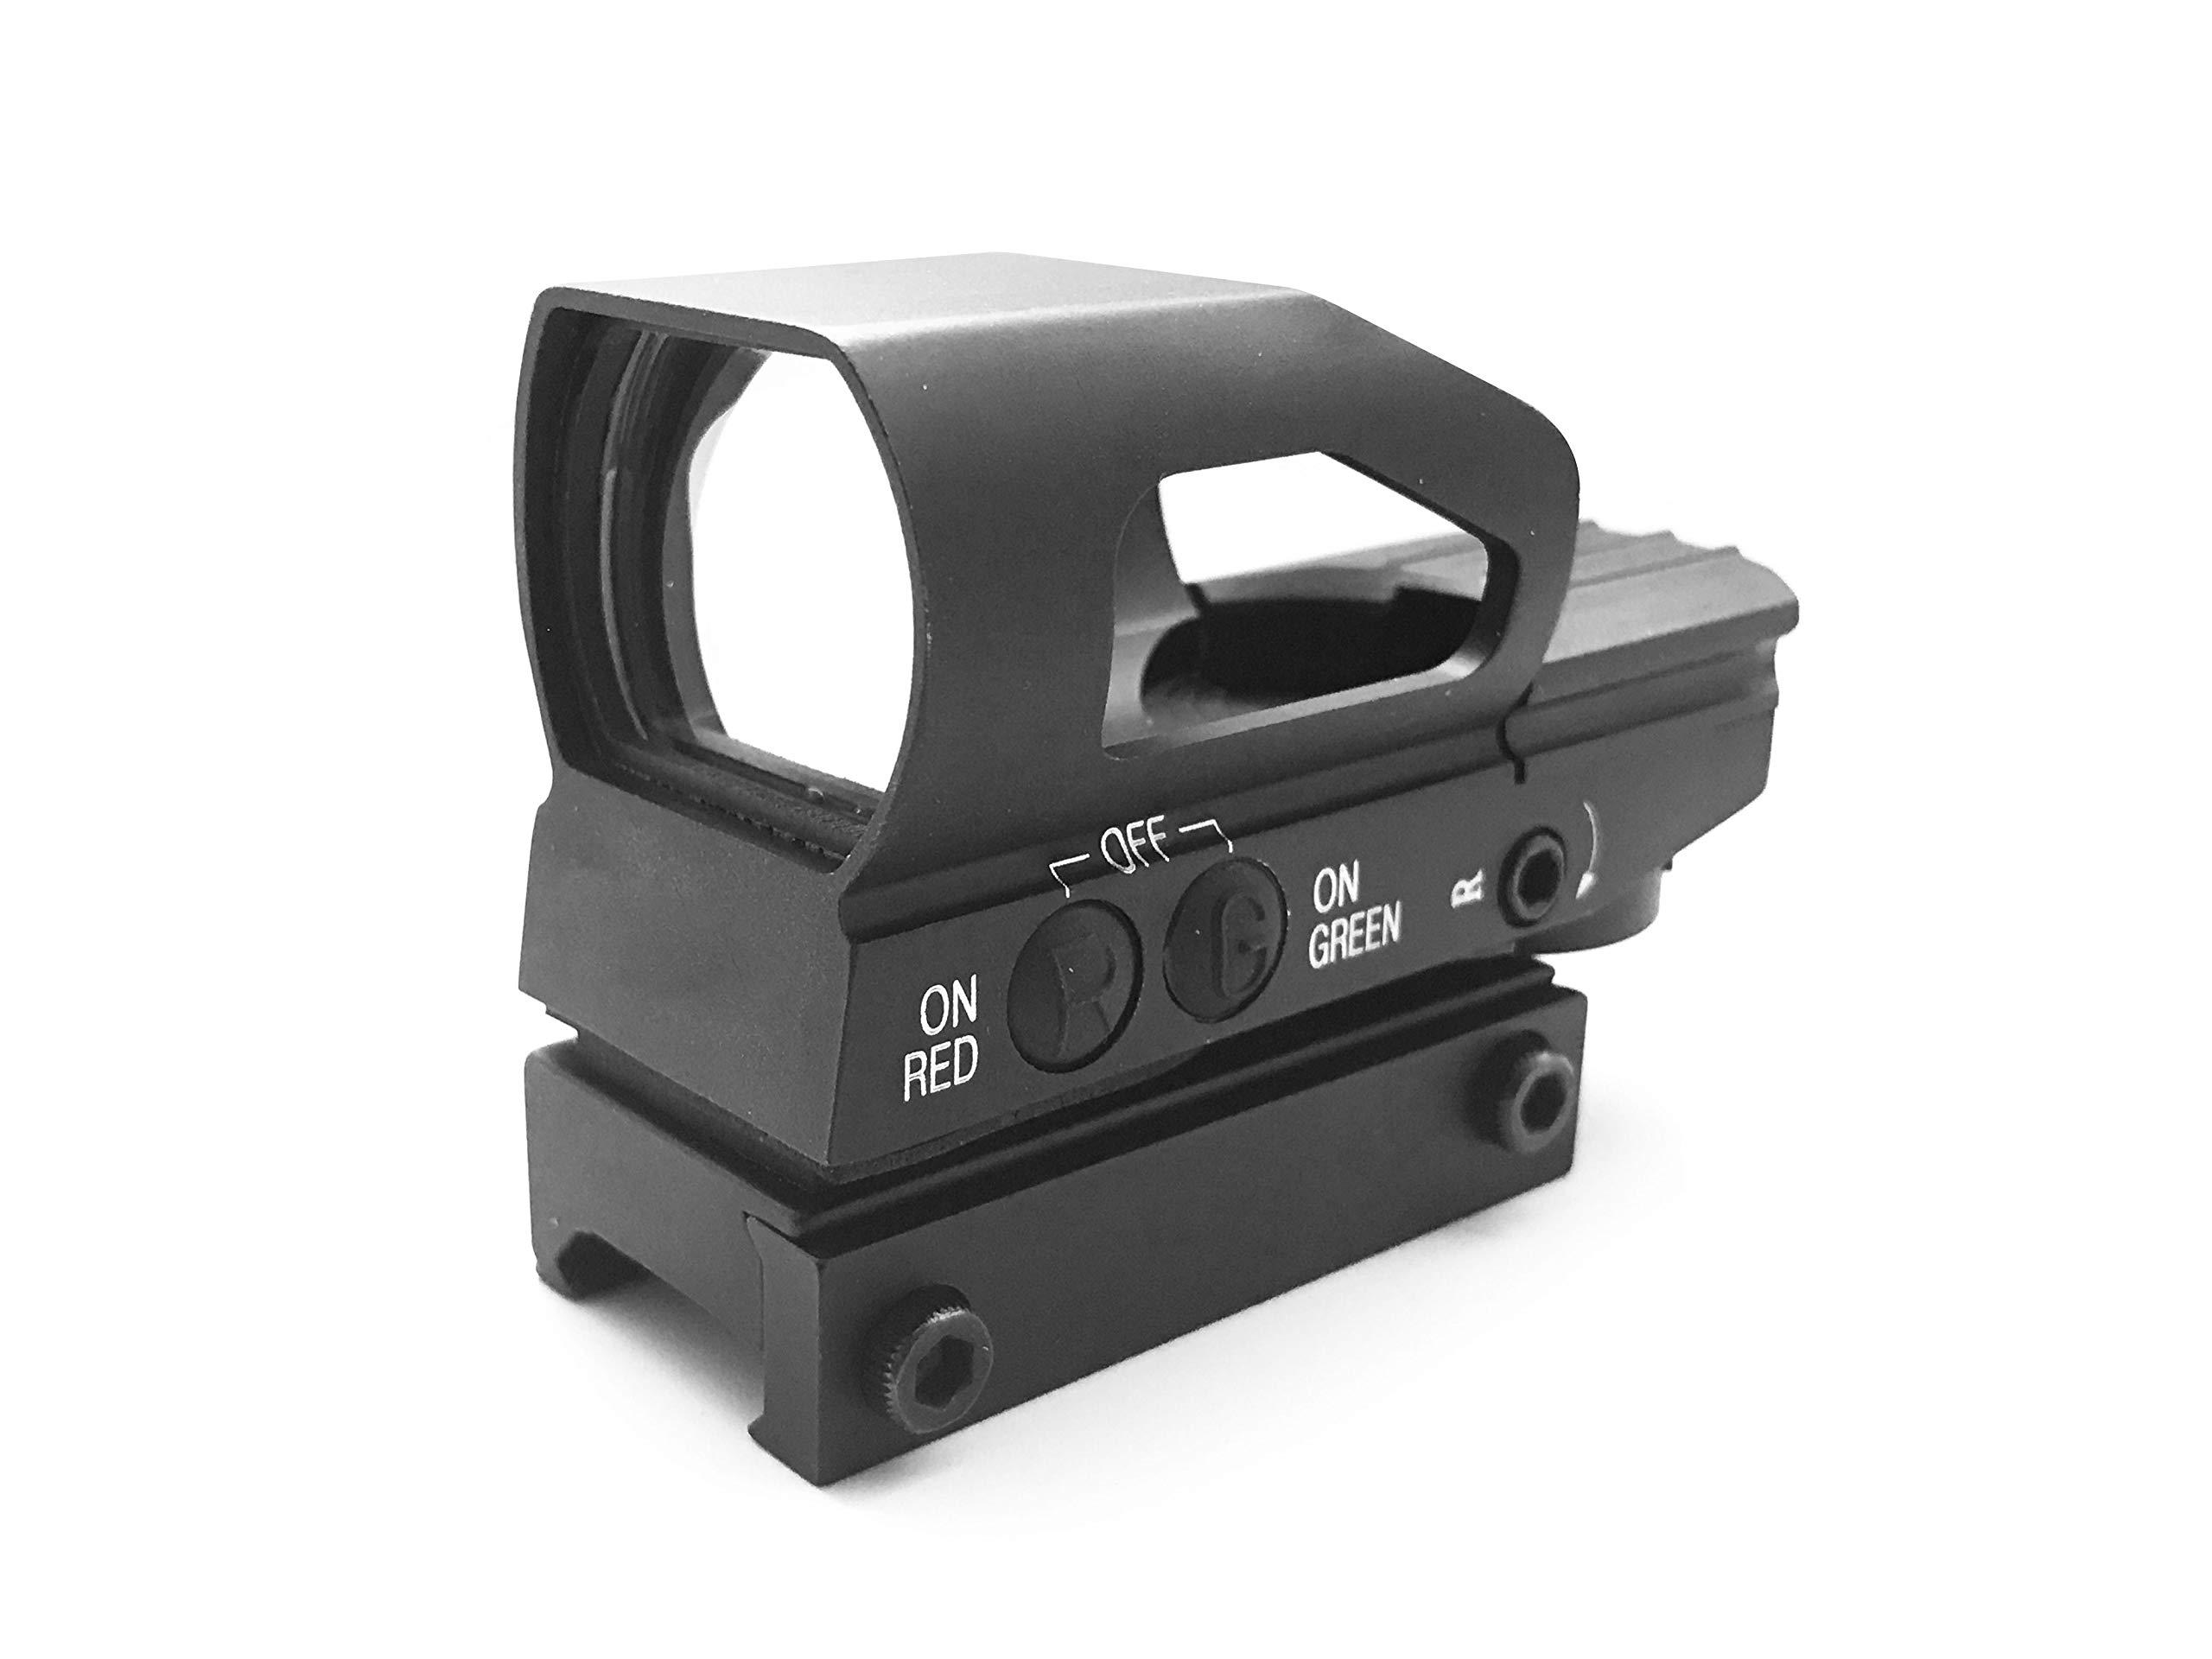 AlphaZ Green Red Dot, Reflex Sight, Red Dot Sight con sistema de retícula múltiple de montaje en riel